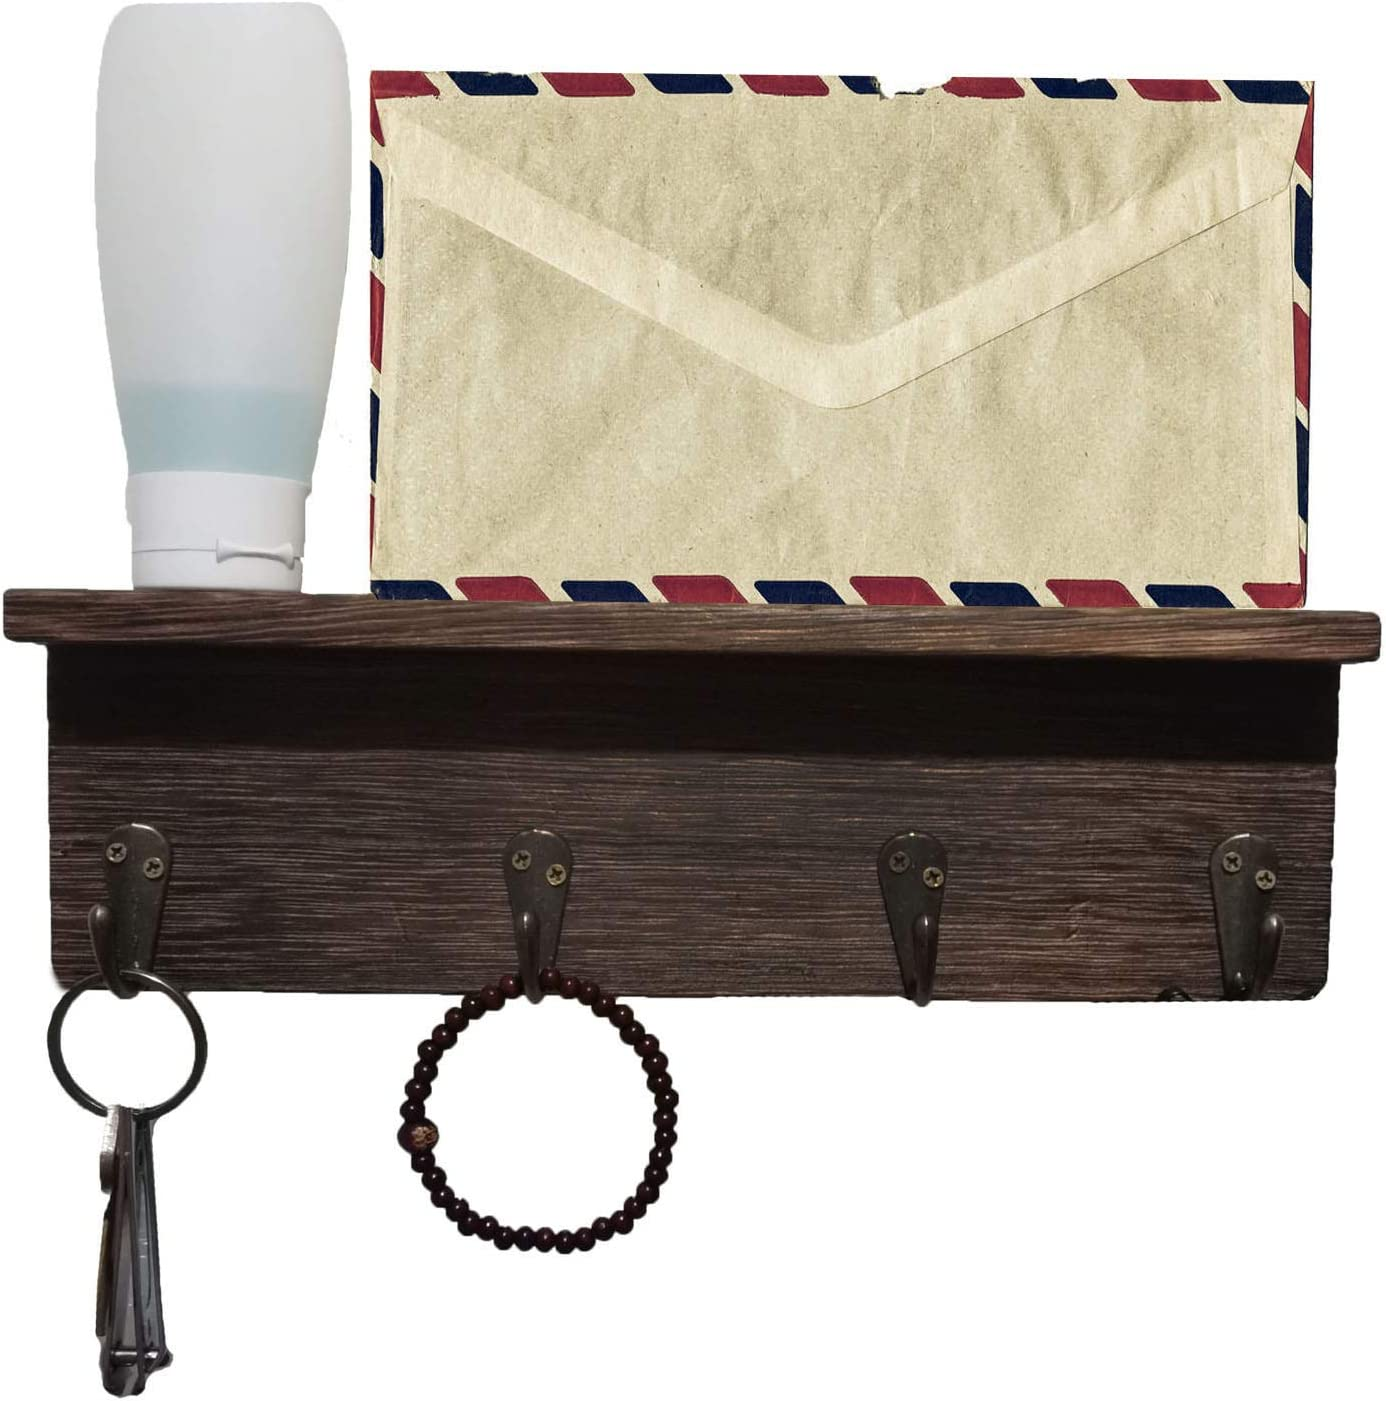 Key Holder Mail Shelf Wall Mounted- Wooden HooksOrganizerwith4 Key Rack,Wall DecorativeKey HooksHangers for Entryway, Storage, Living Room, Hallway, Office